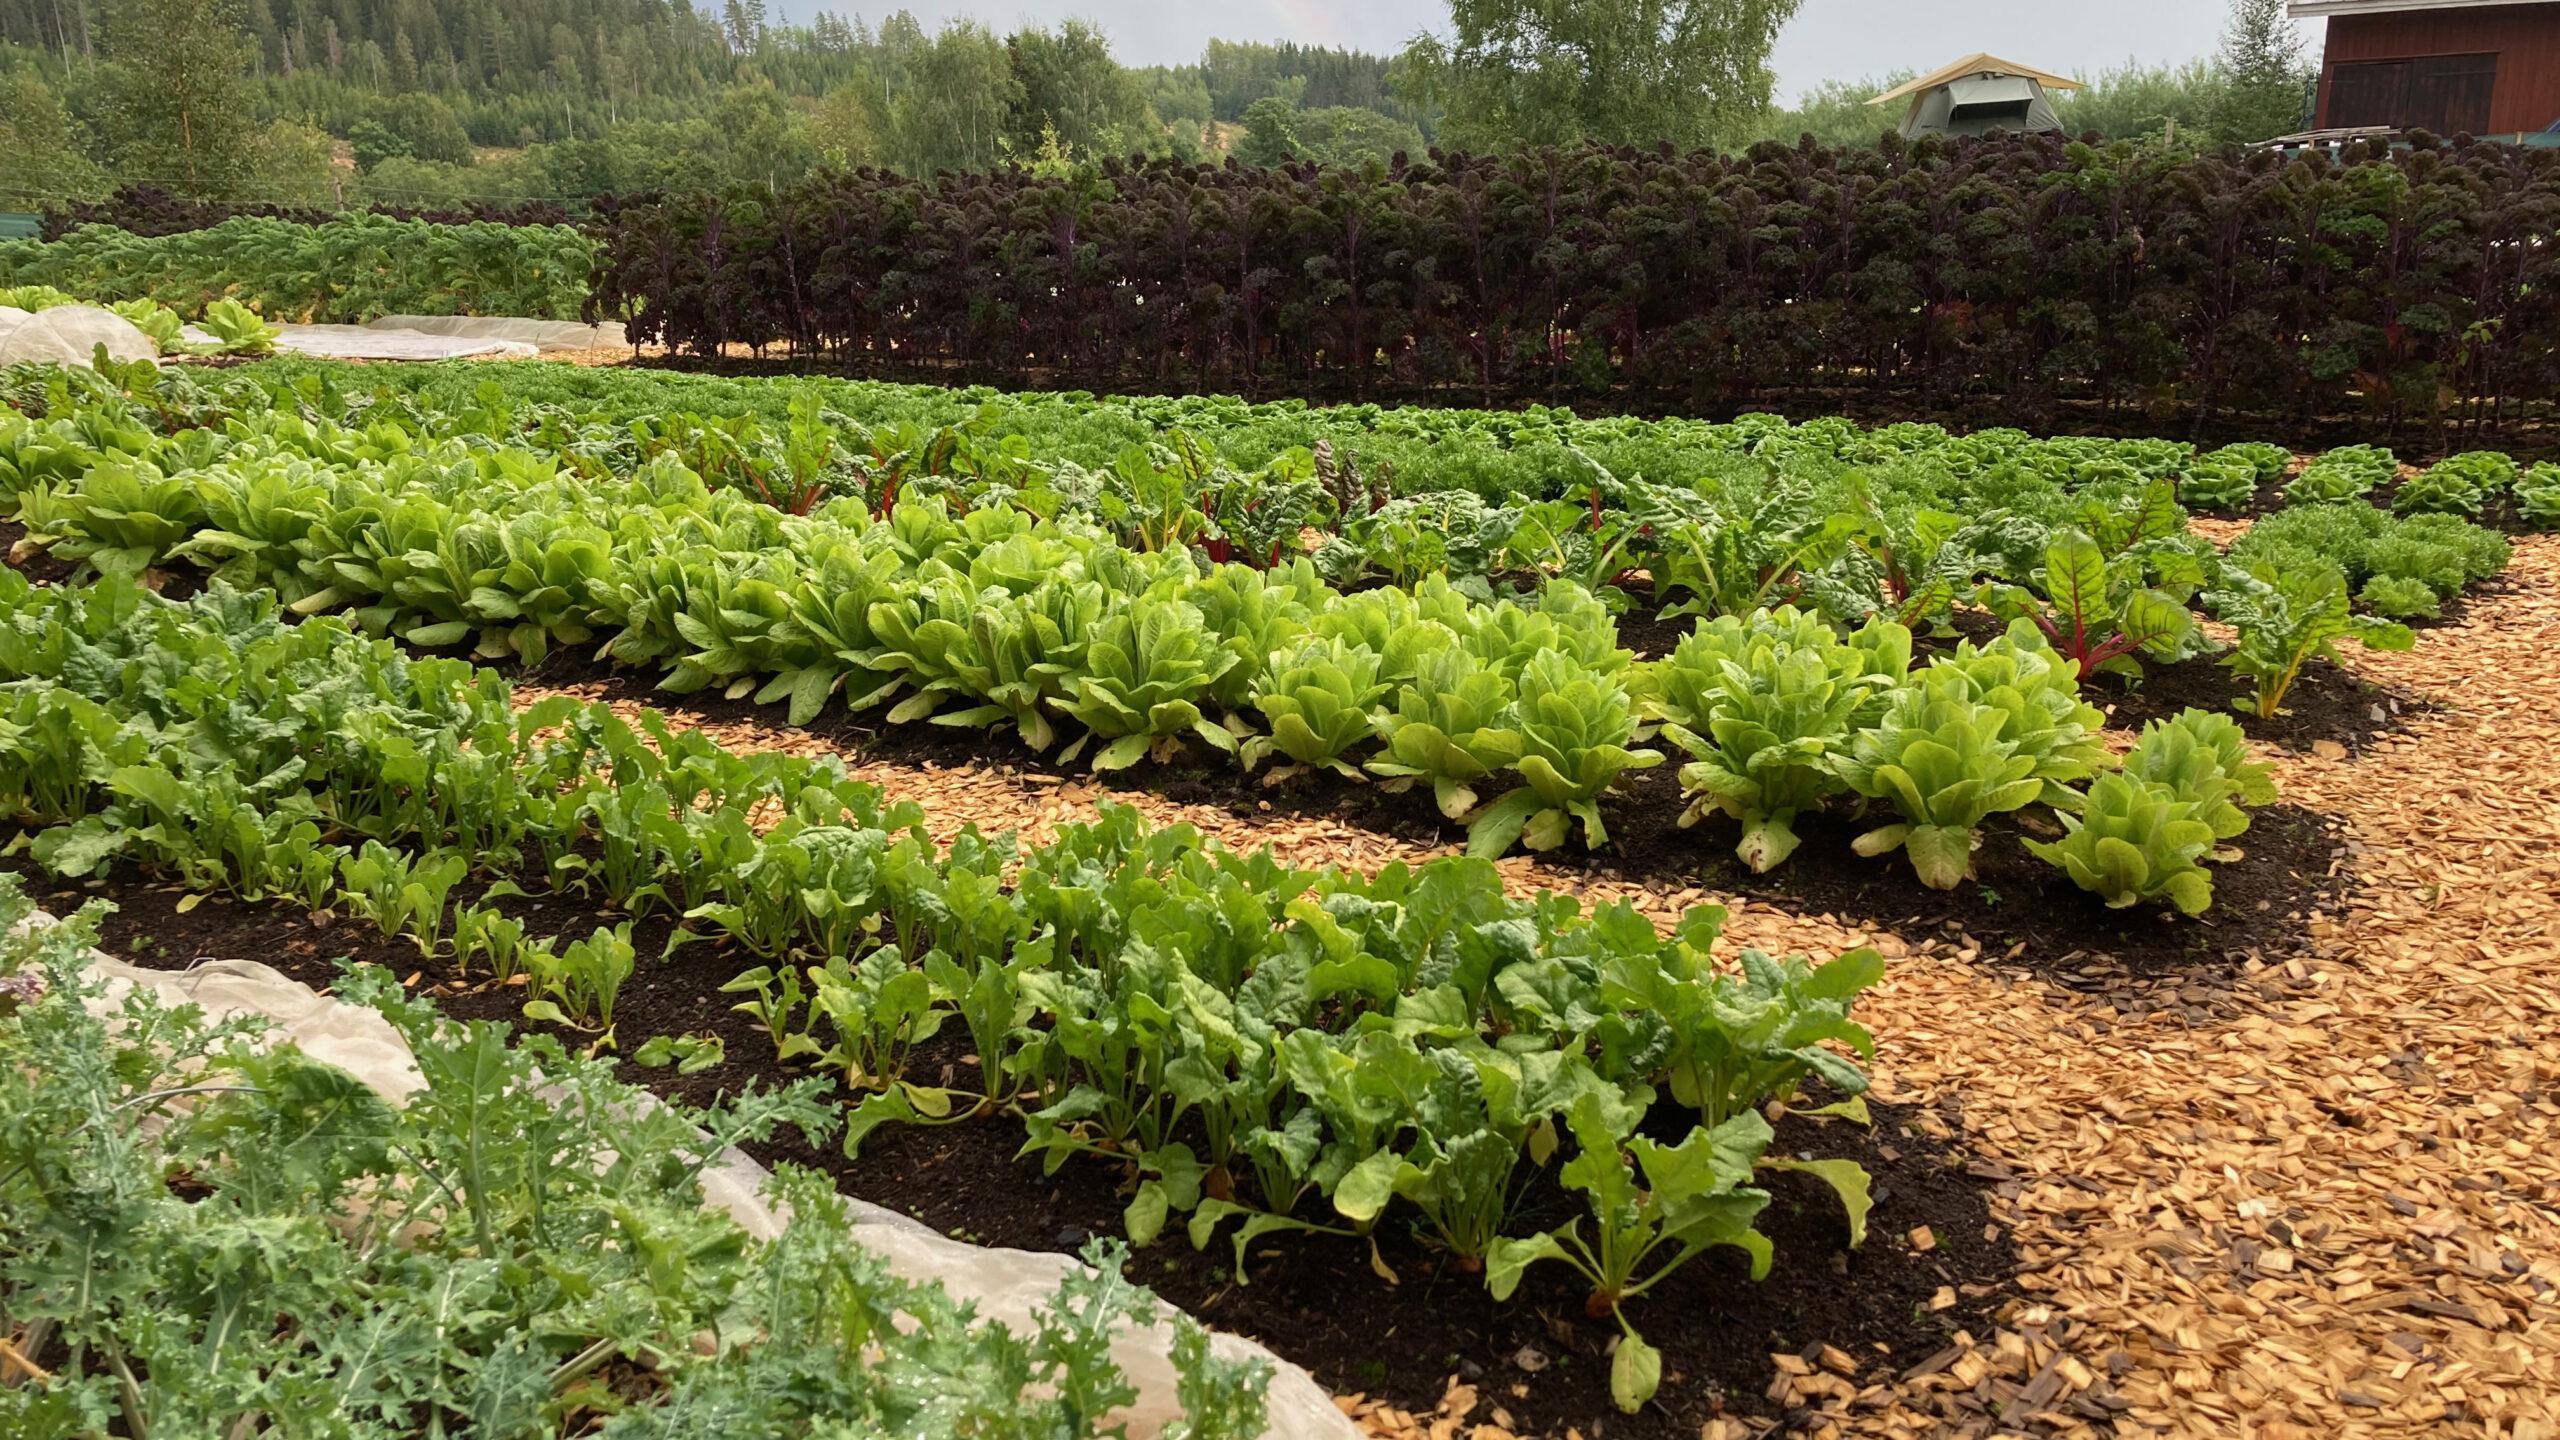 Ridgedale Farm Marketgarden